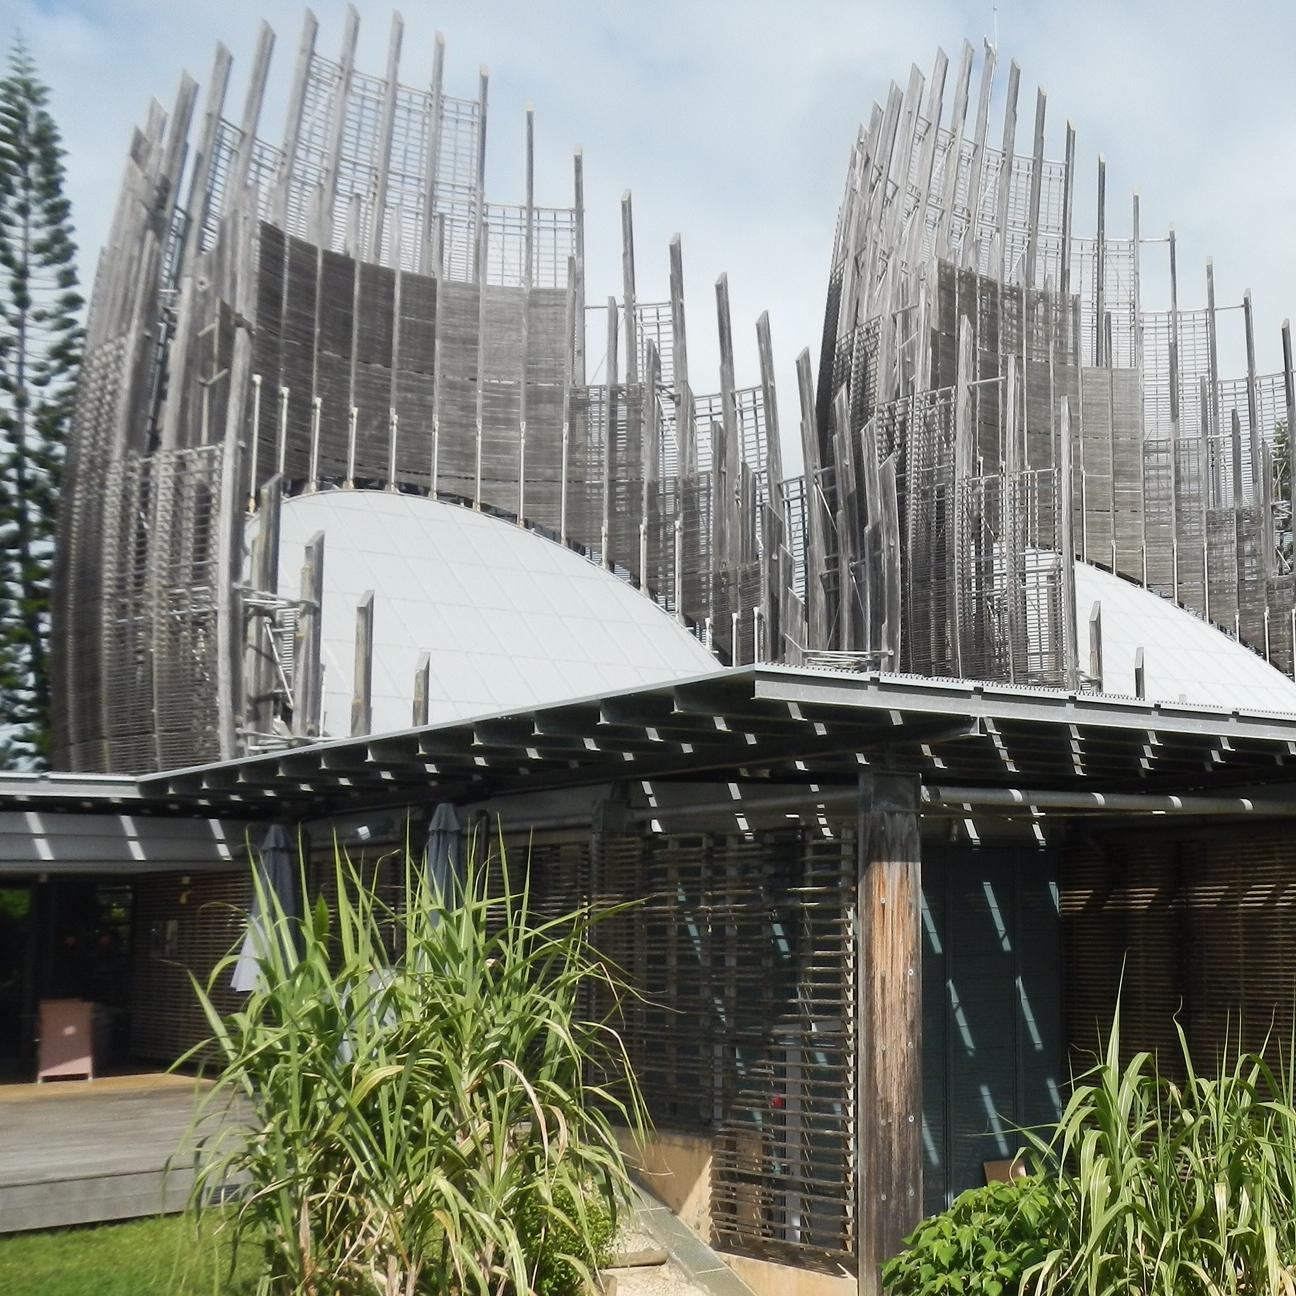 Centre Cuturel Jean-Marie Tjibaou, Noumea by The Doubtful Traveller